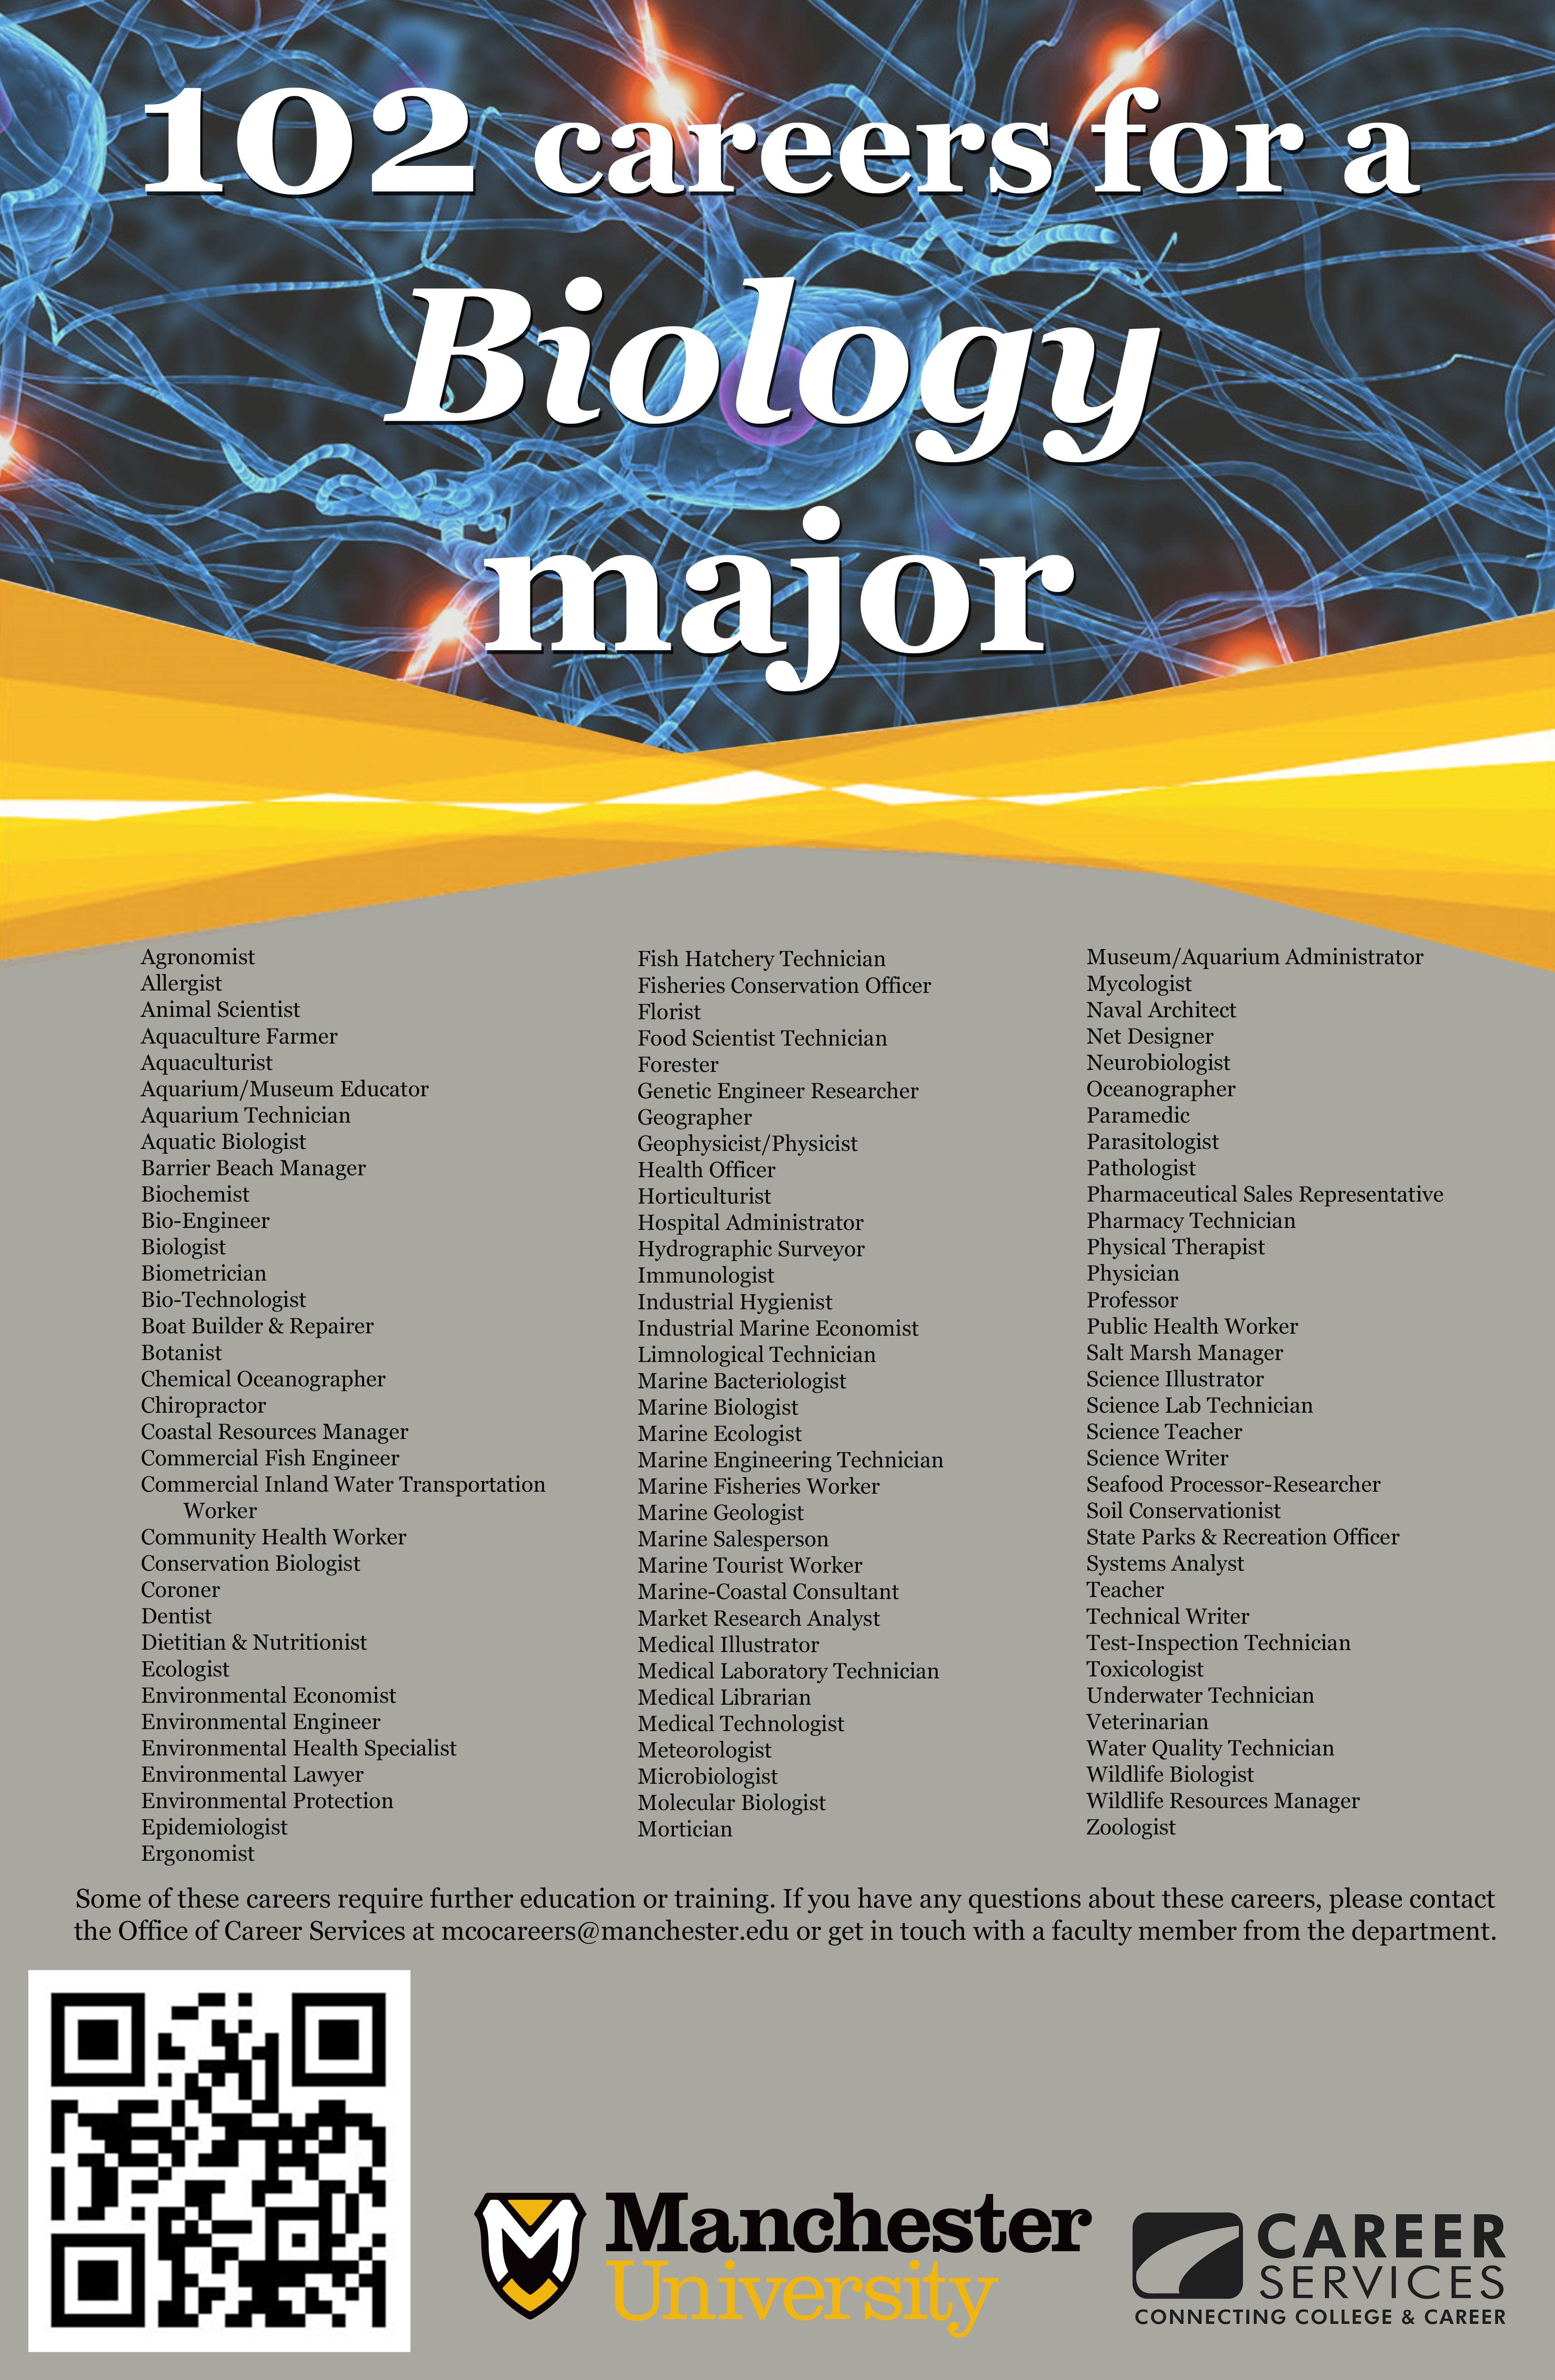 Best 25+ Biotechnology careers ideas on Pinterest | Biology jobs, Biotechnology jobs and ...